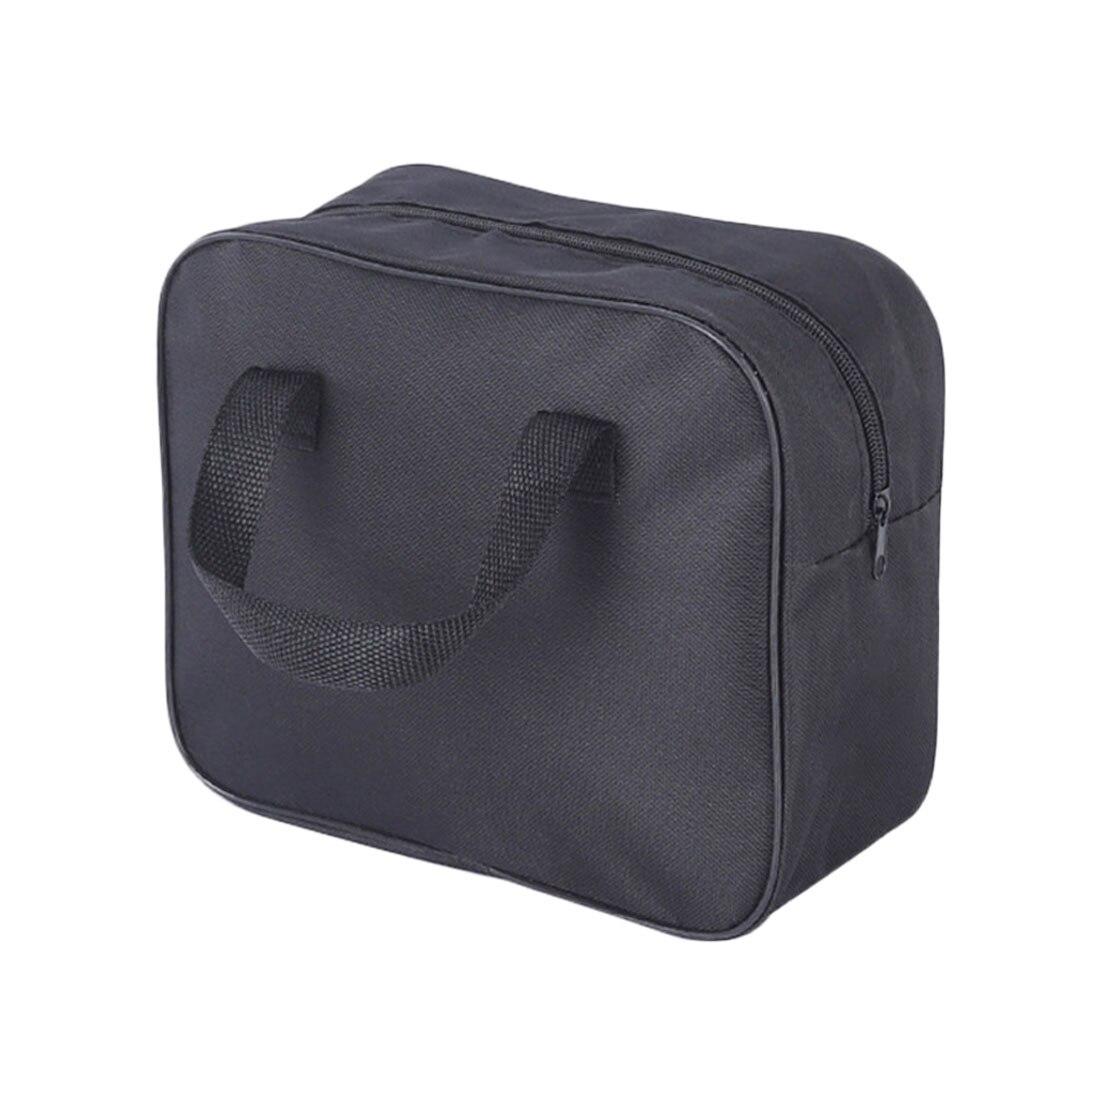 Oxford Cloth Tool Kit Bag Screws Nuts Drill Hardware Car Repair Kit Handbag Utility Storage Tool Bags Pouch Case For Repair Tool repair tool storage case utility box container for soldering iron rxjb